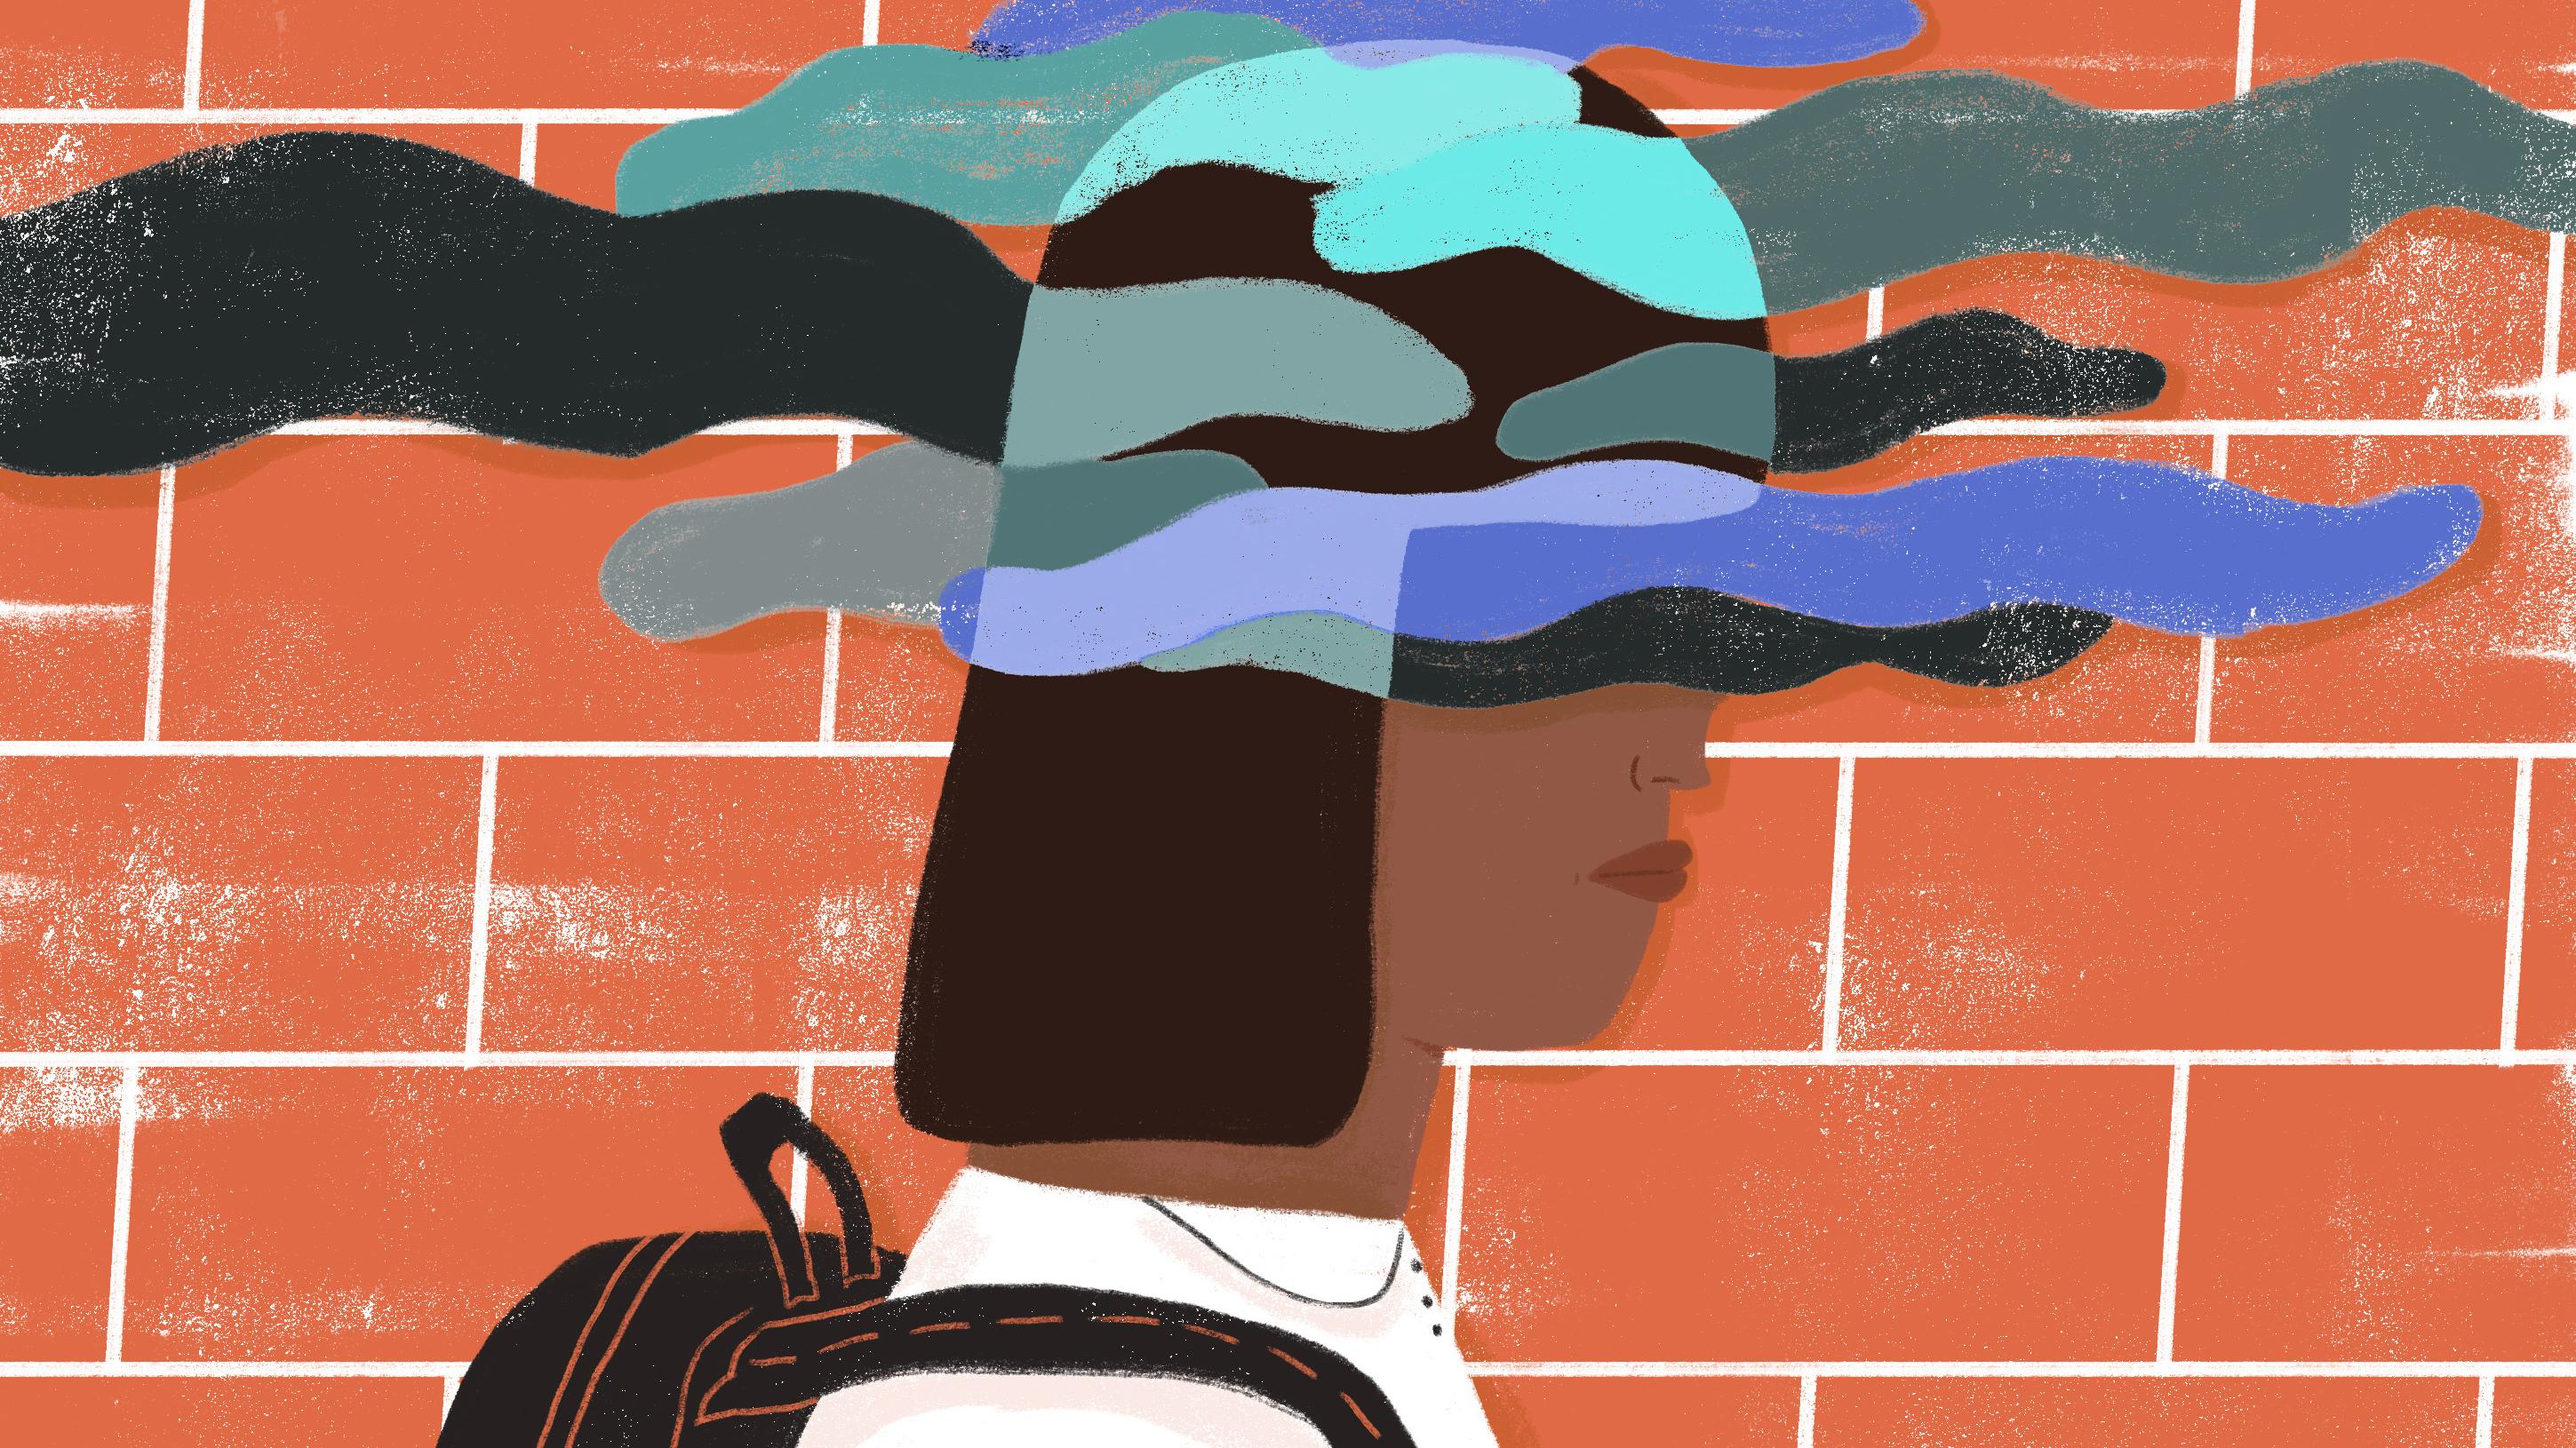 npr.org - Muslim Schoolchildren Bullied By Fellow Students And Teachers